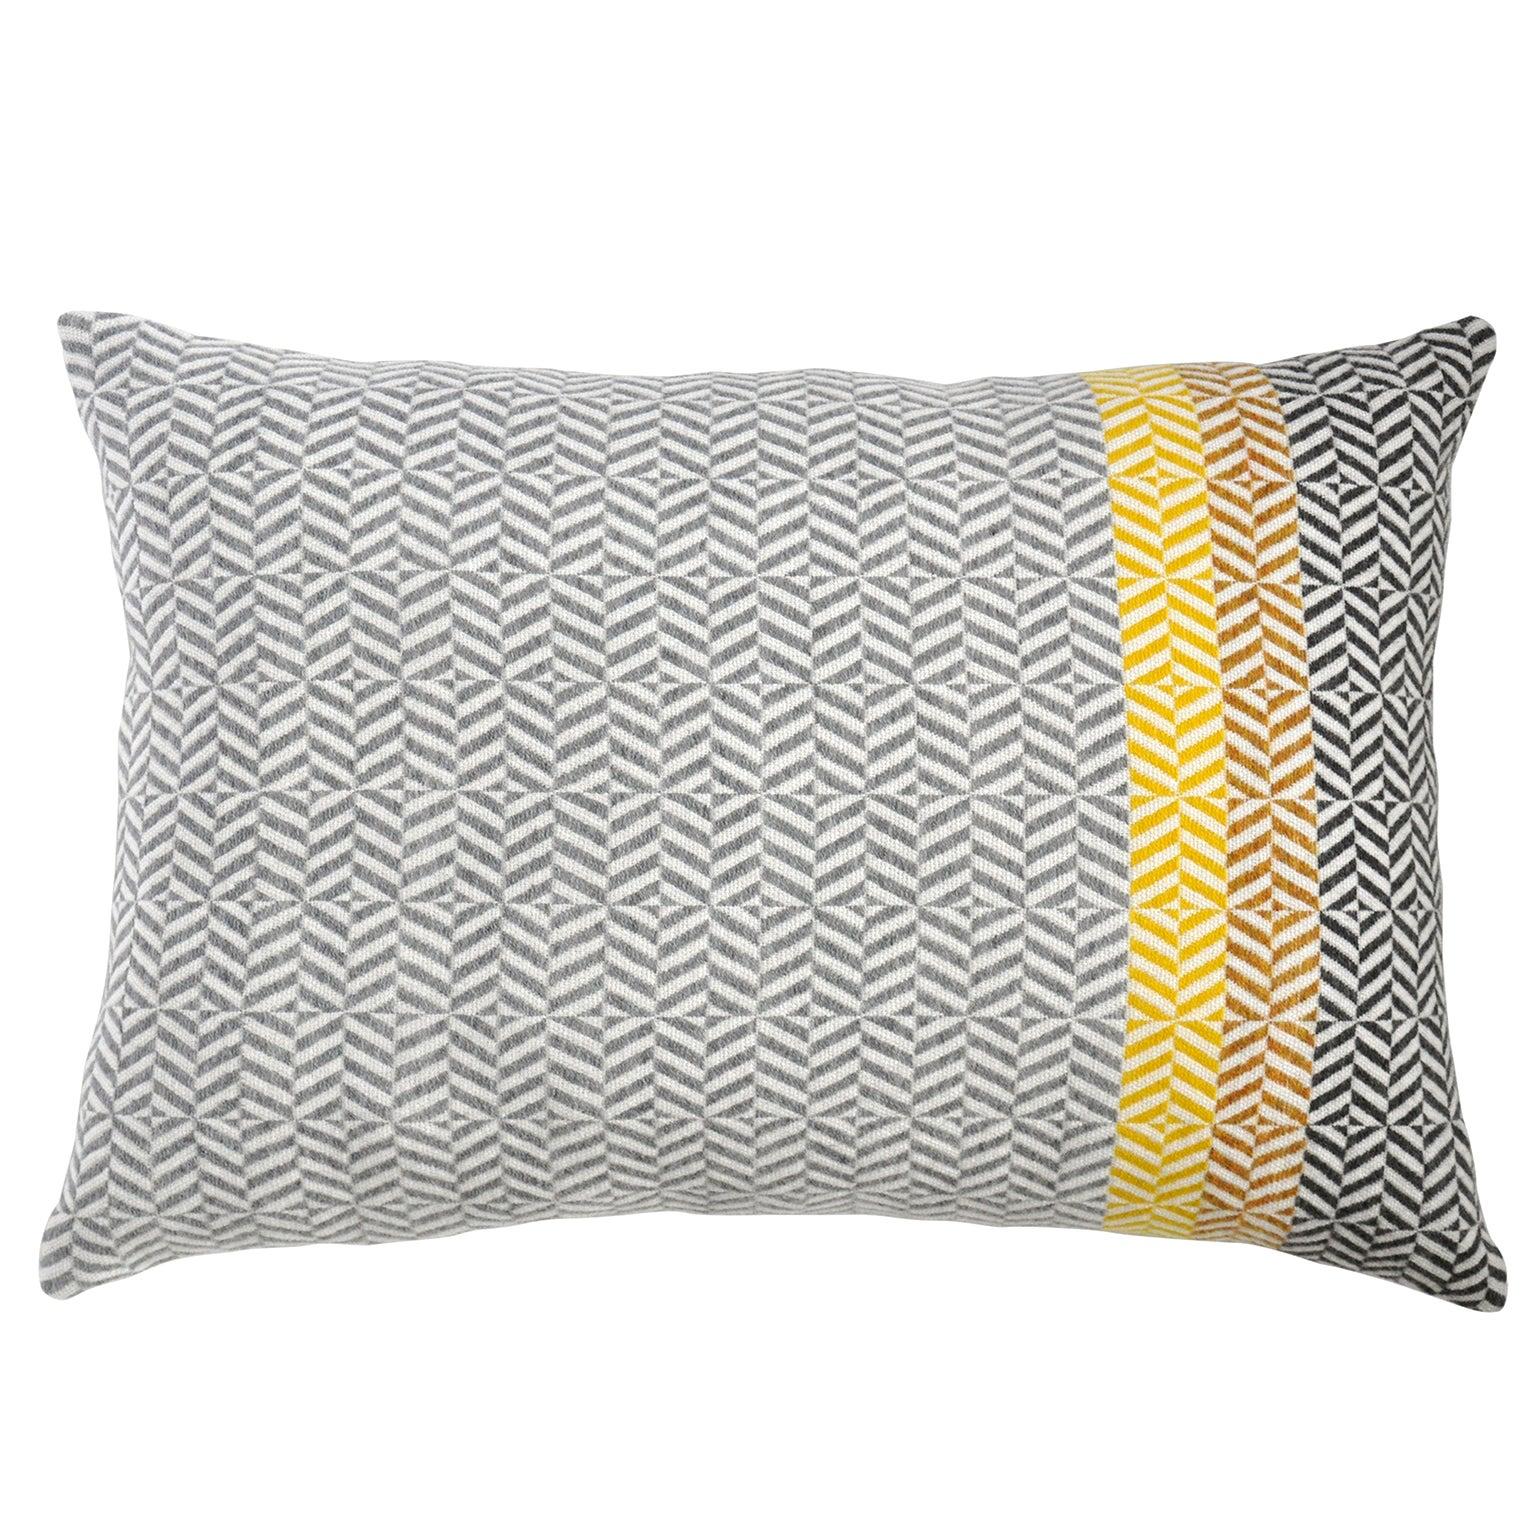 Handwoven 'Uccle' Geometric Large Merino Wool Cushion Pillow, Piccalilli/Greys